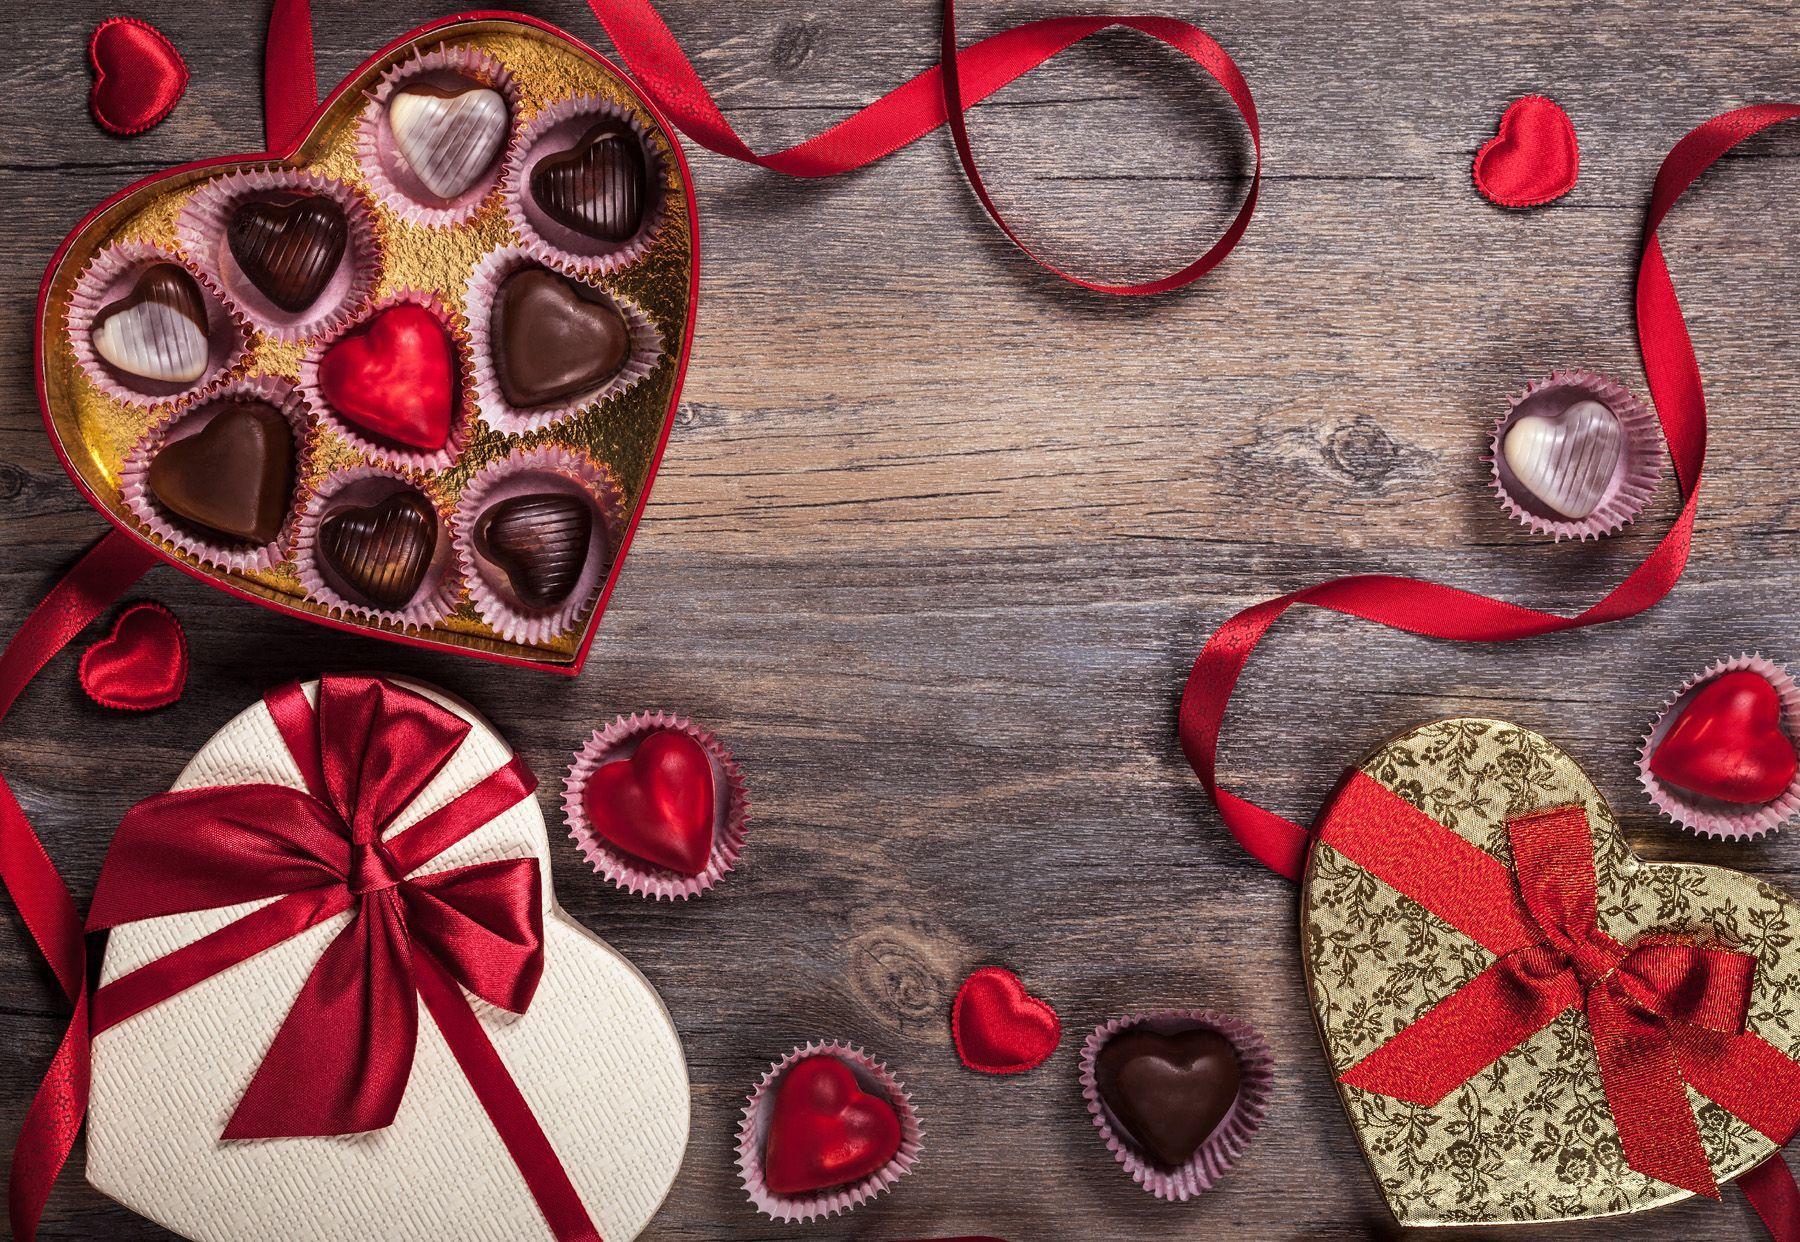 Valentine 39 s day chocolate wallpapers wallpaper cave - San valentin desktop backgrounds ...